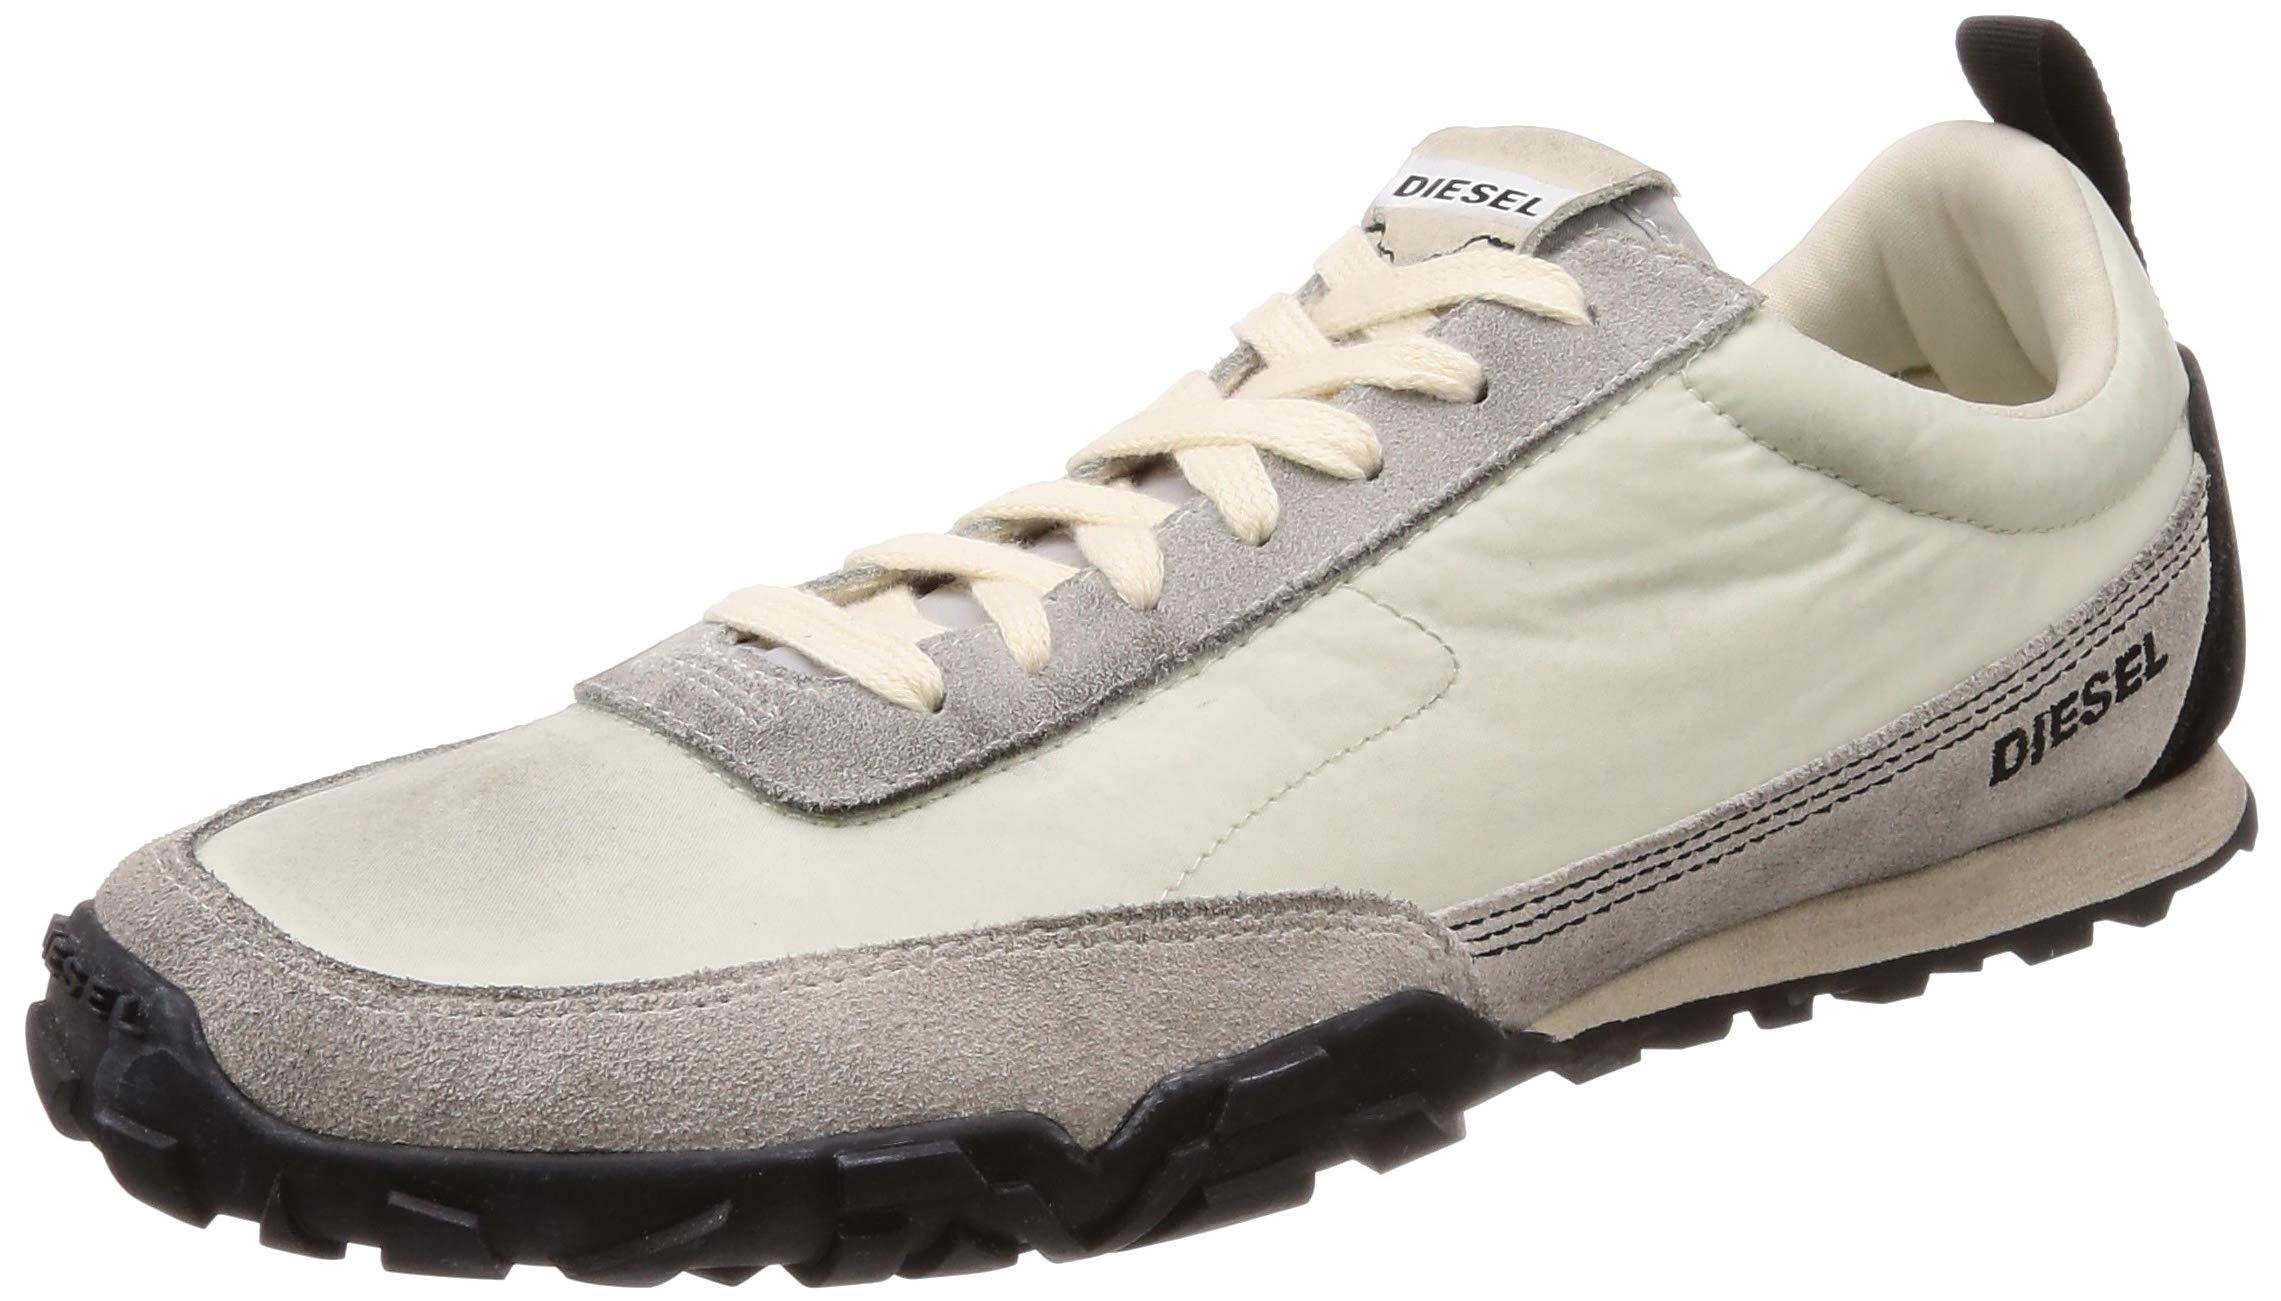 Low Sneaker, Dirty/White